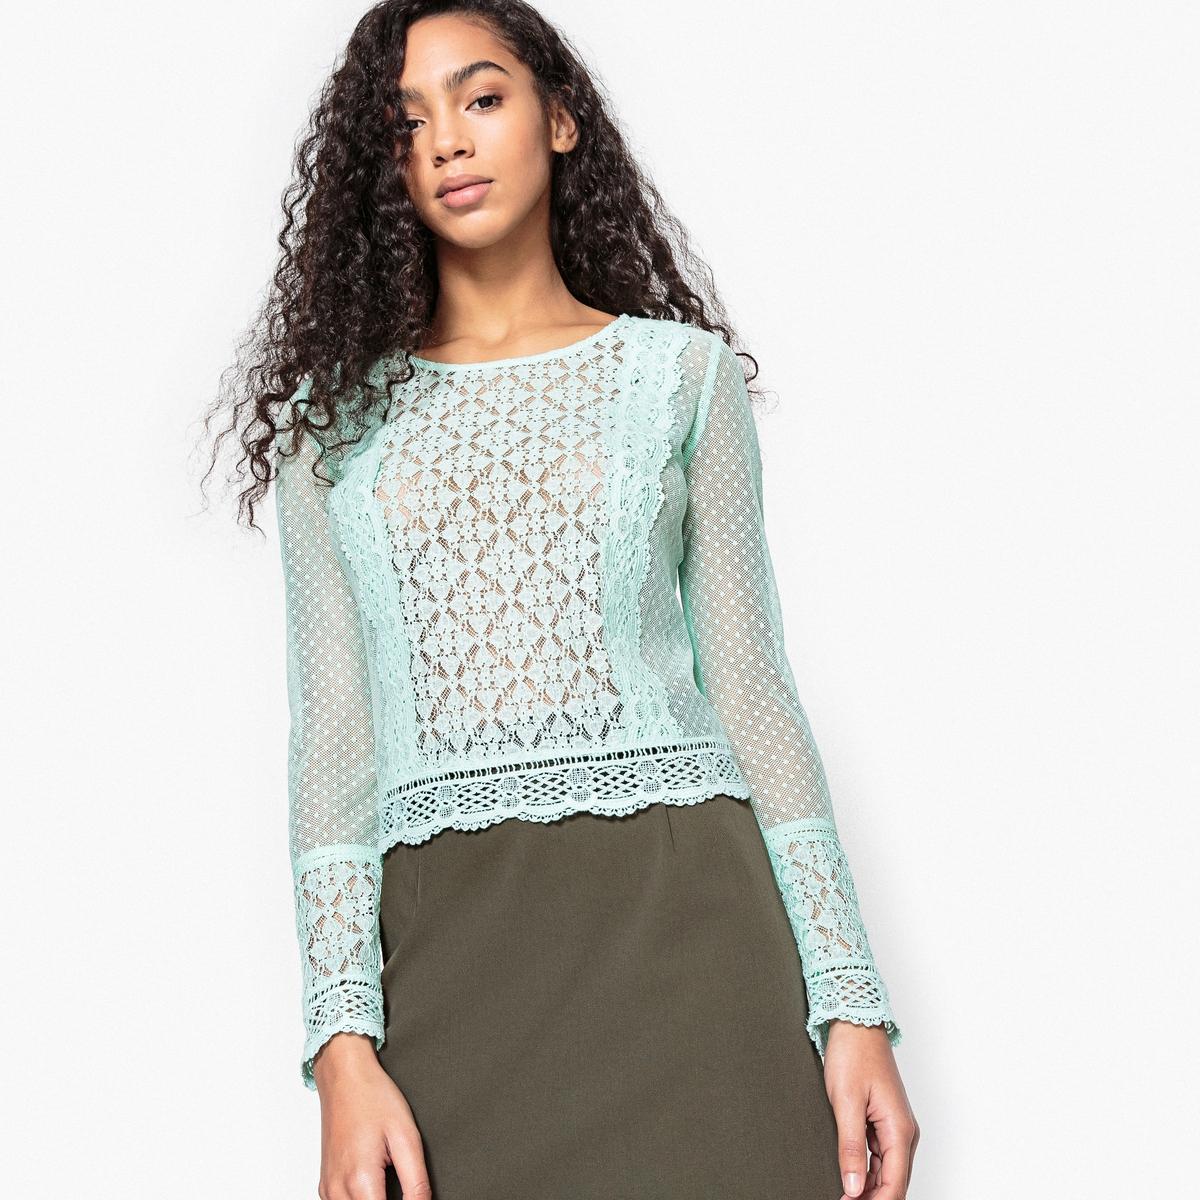 Блузка MADEMOISELLE R 5308158 от LaRedoute